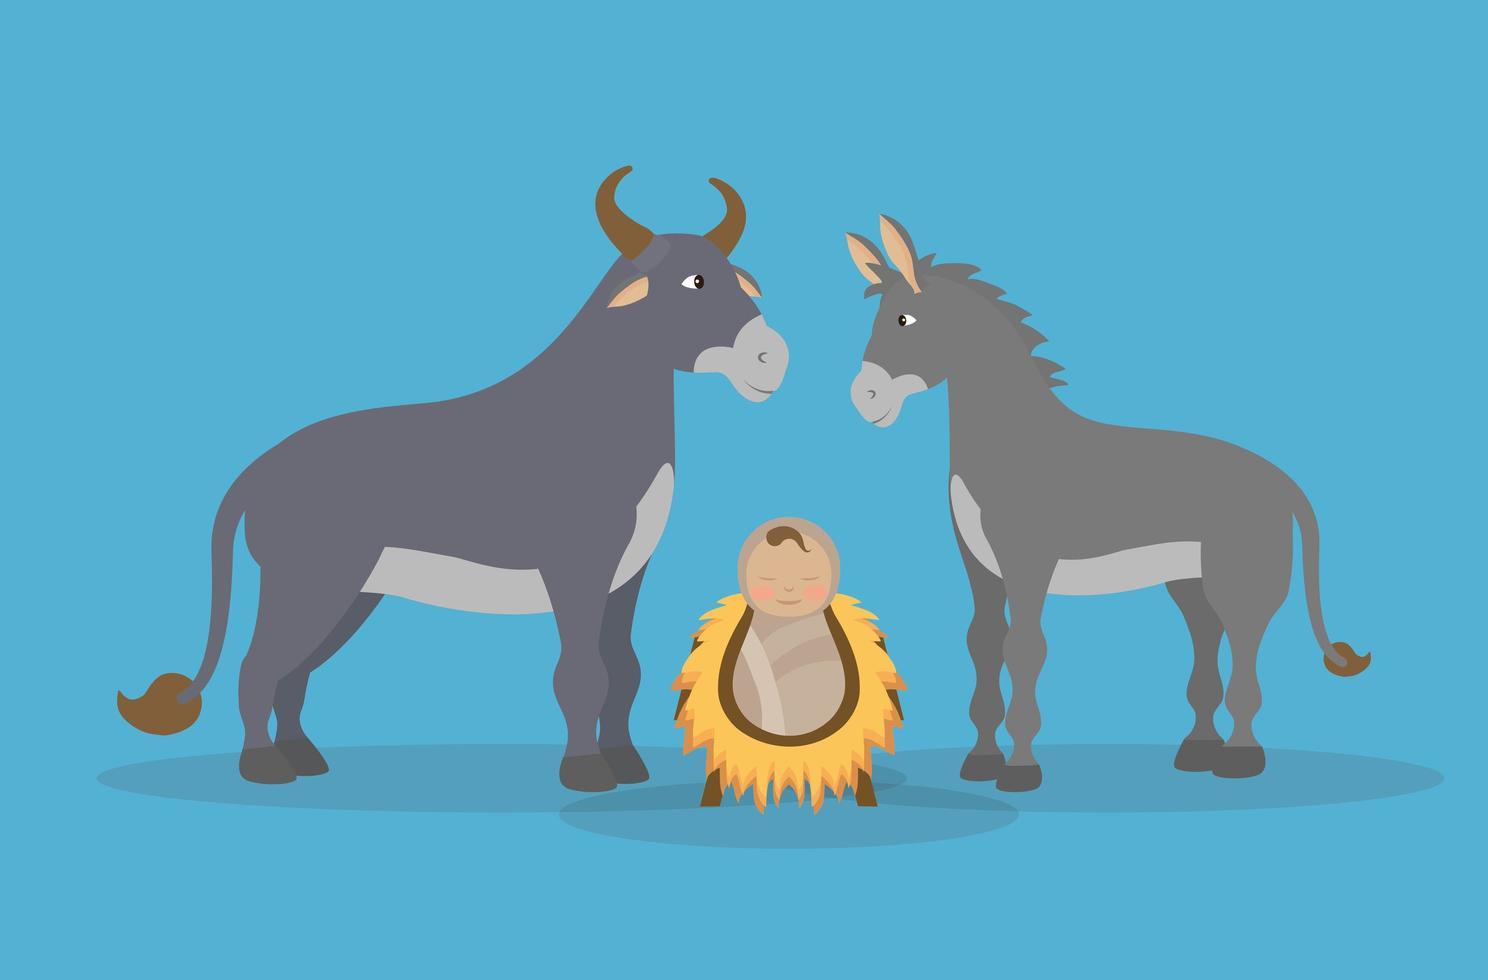 epifania de jesus, animais e bebê cristo vetor